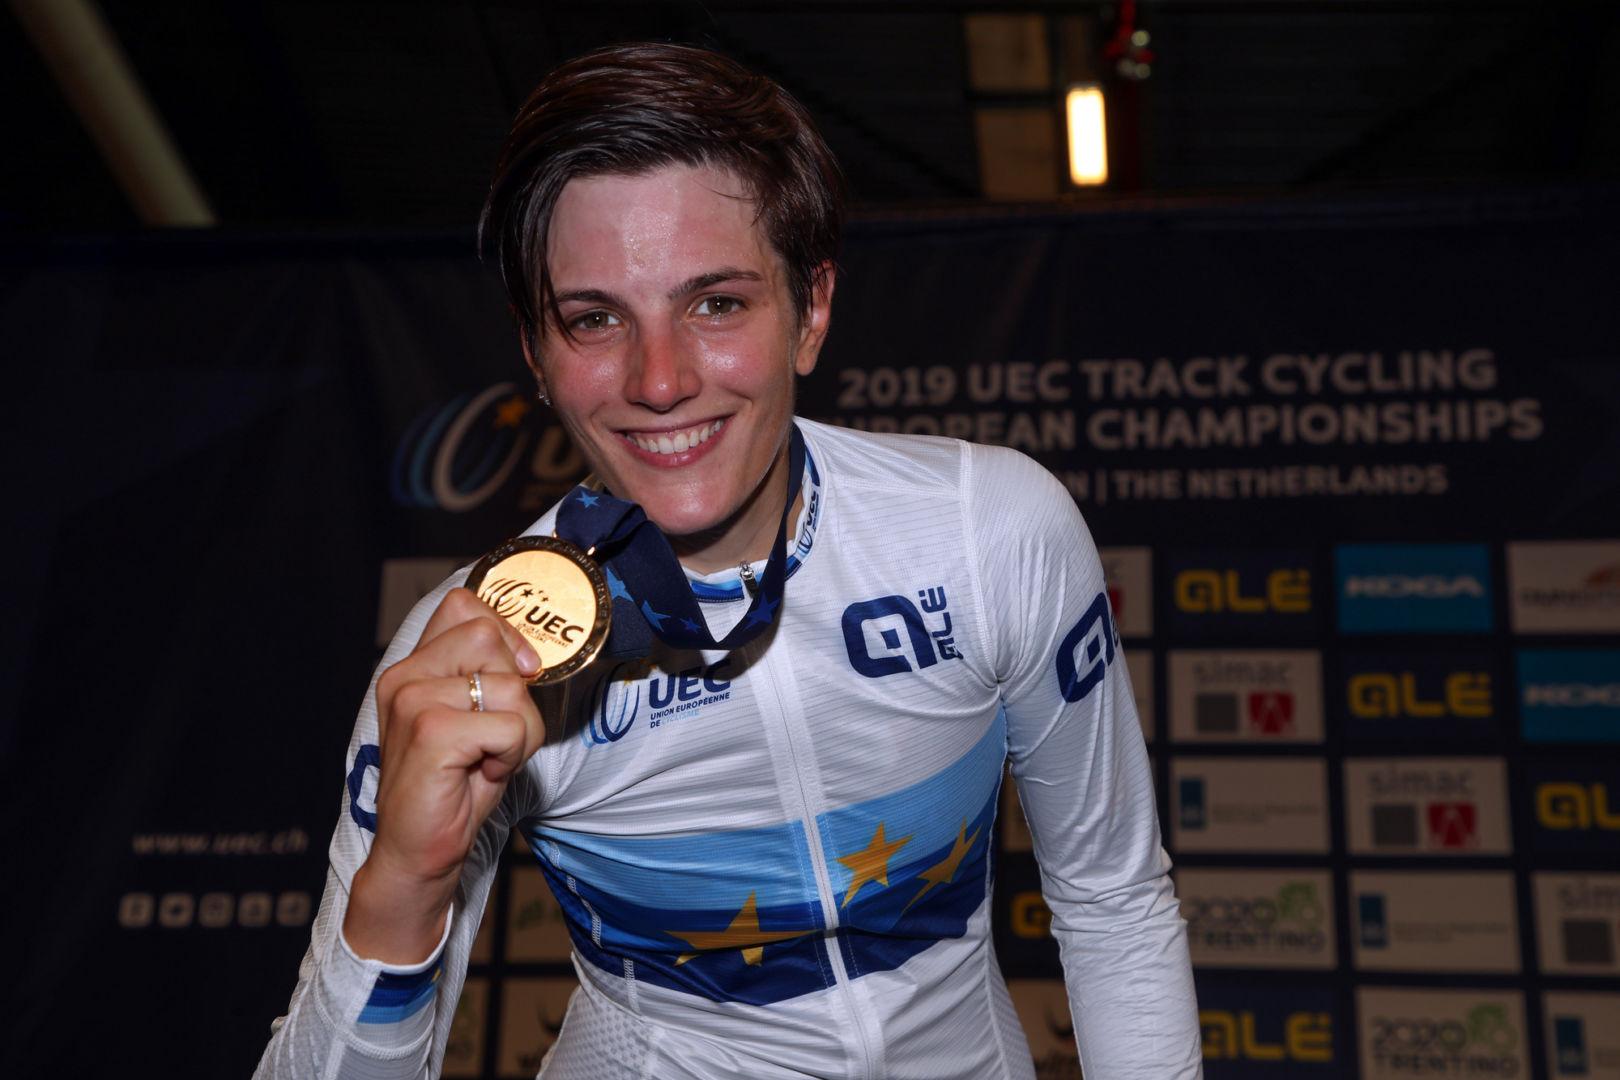 Ciclismo: la Confalonieri vince oro a punti